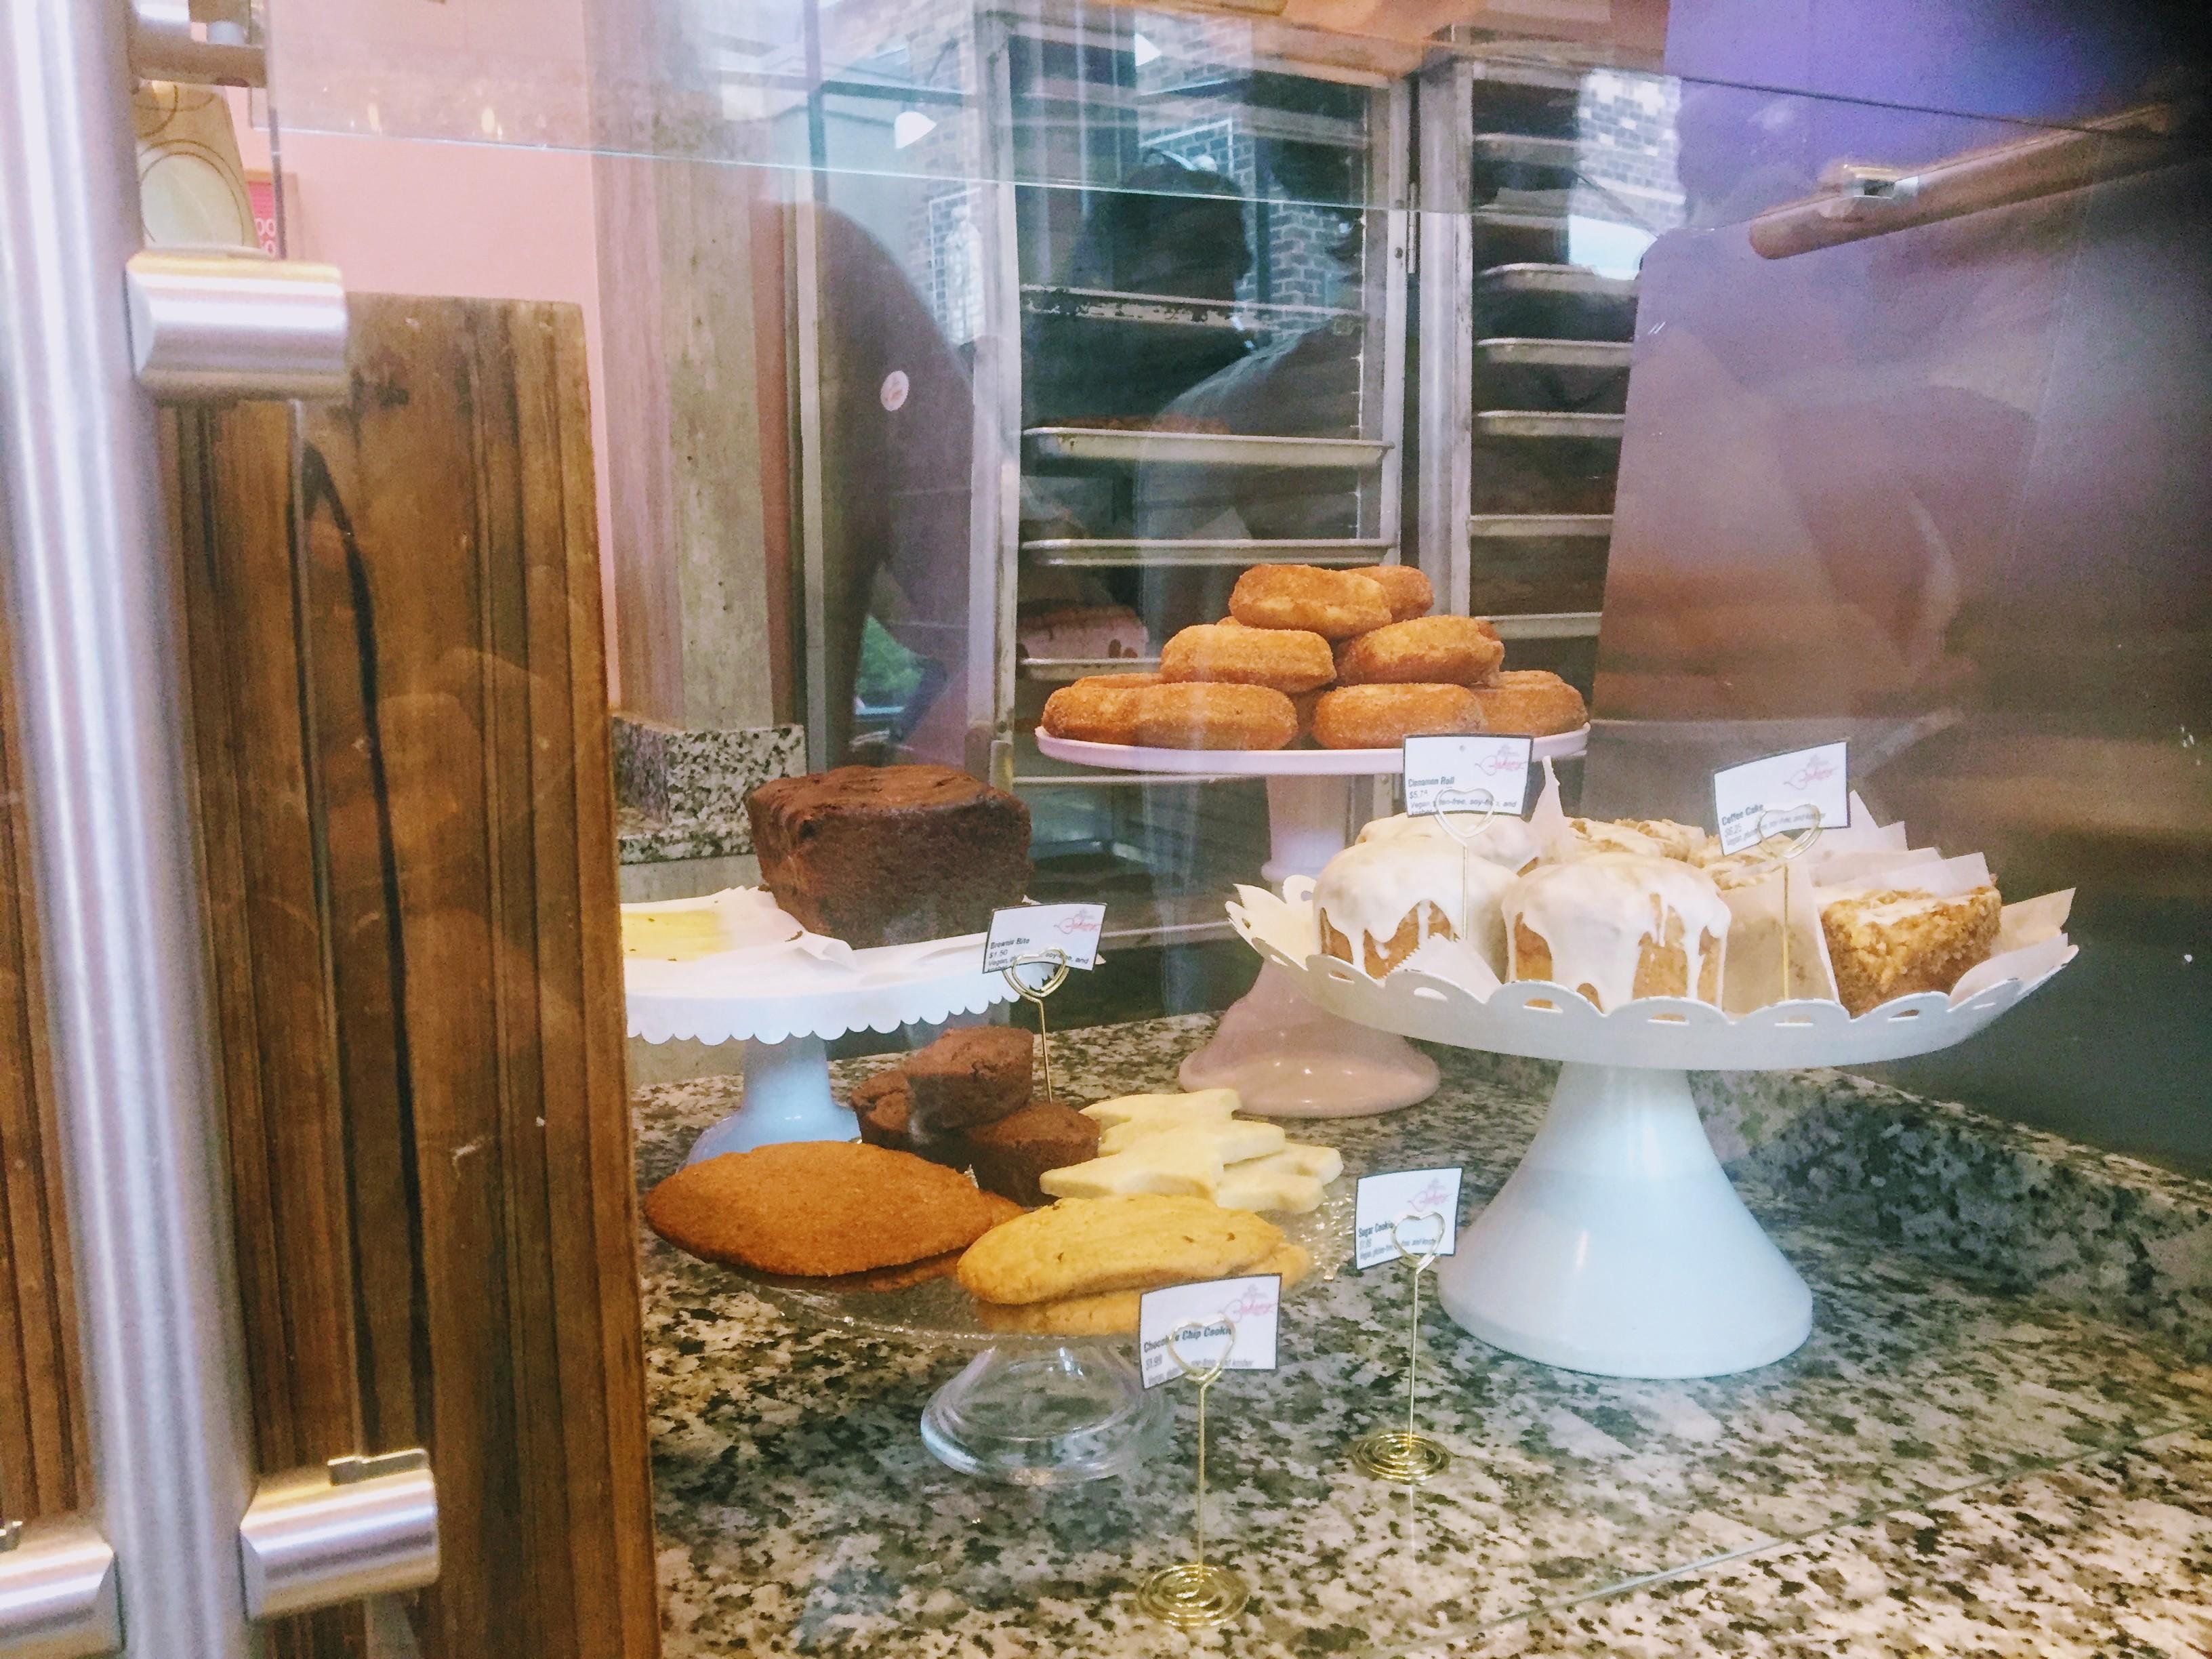 Early Fall at Erin McKenna's Bakery Disney Springs Gluten Free Vegan